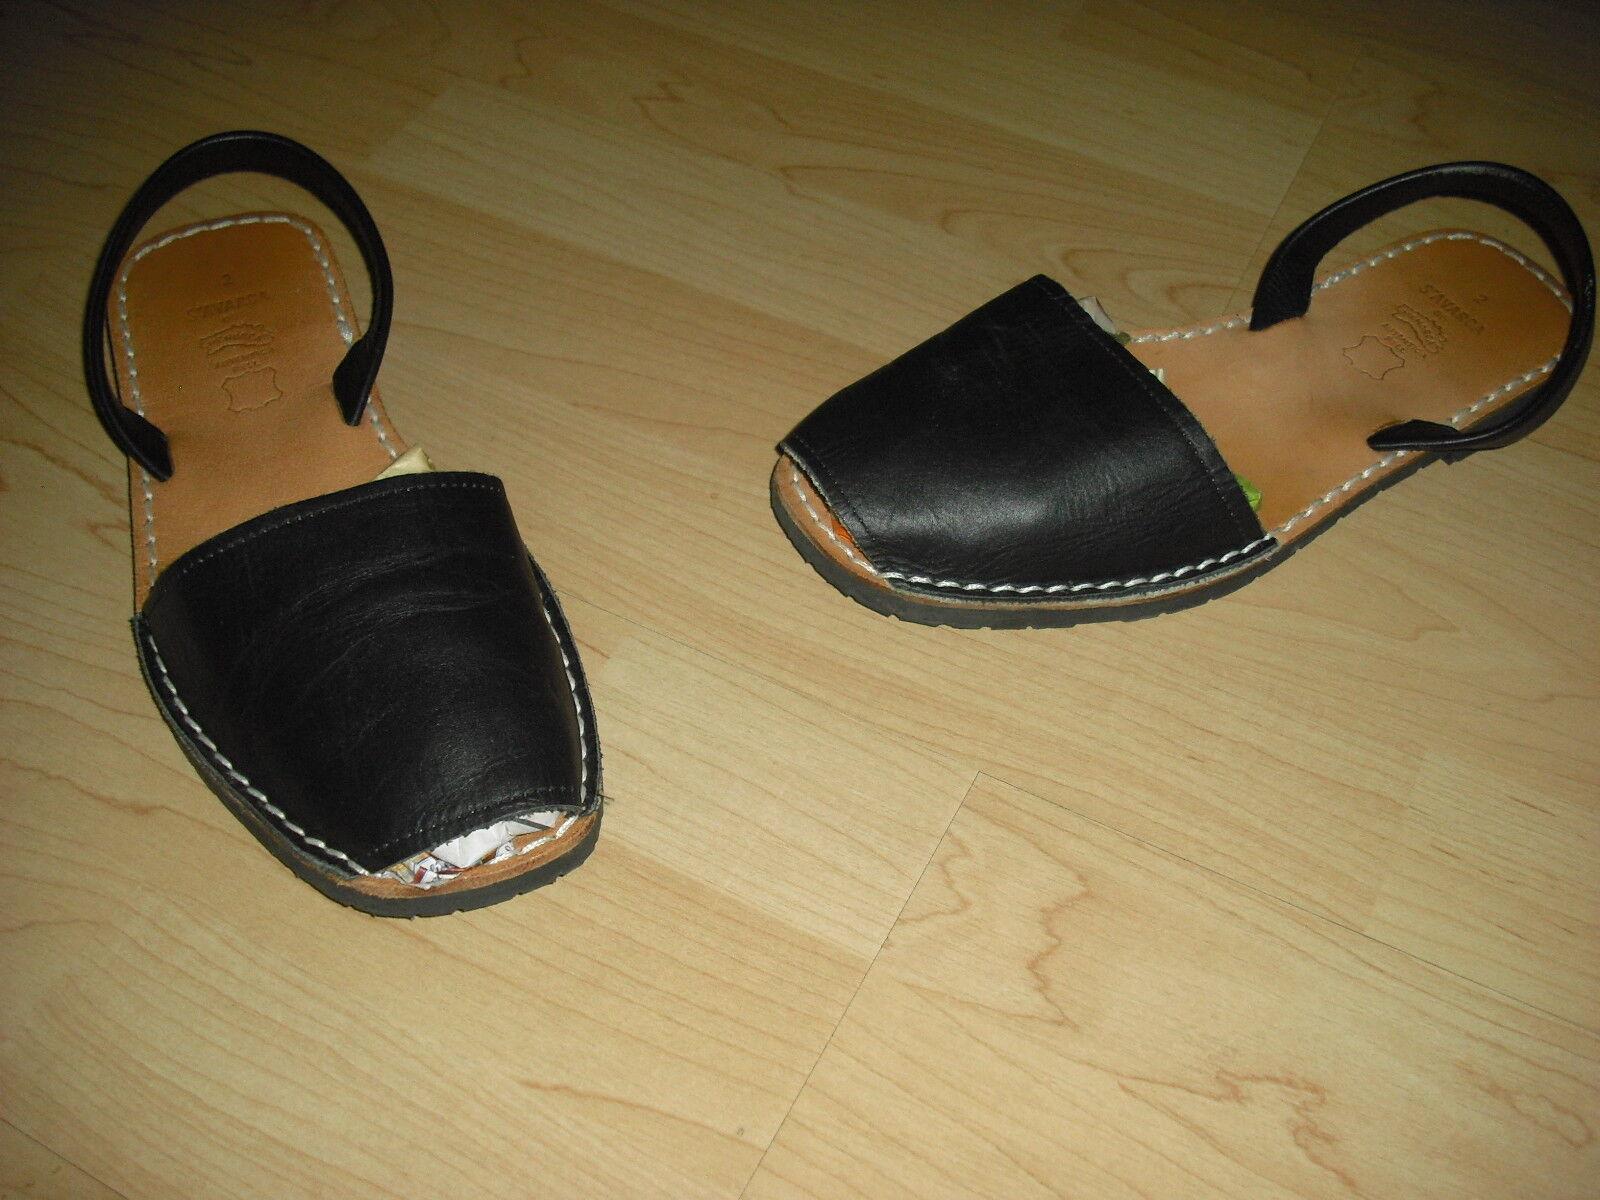 Sandale Menorca Avarca Menorquinas echt Leder schwarz braun Gr. 41 NEU